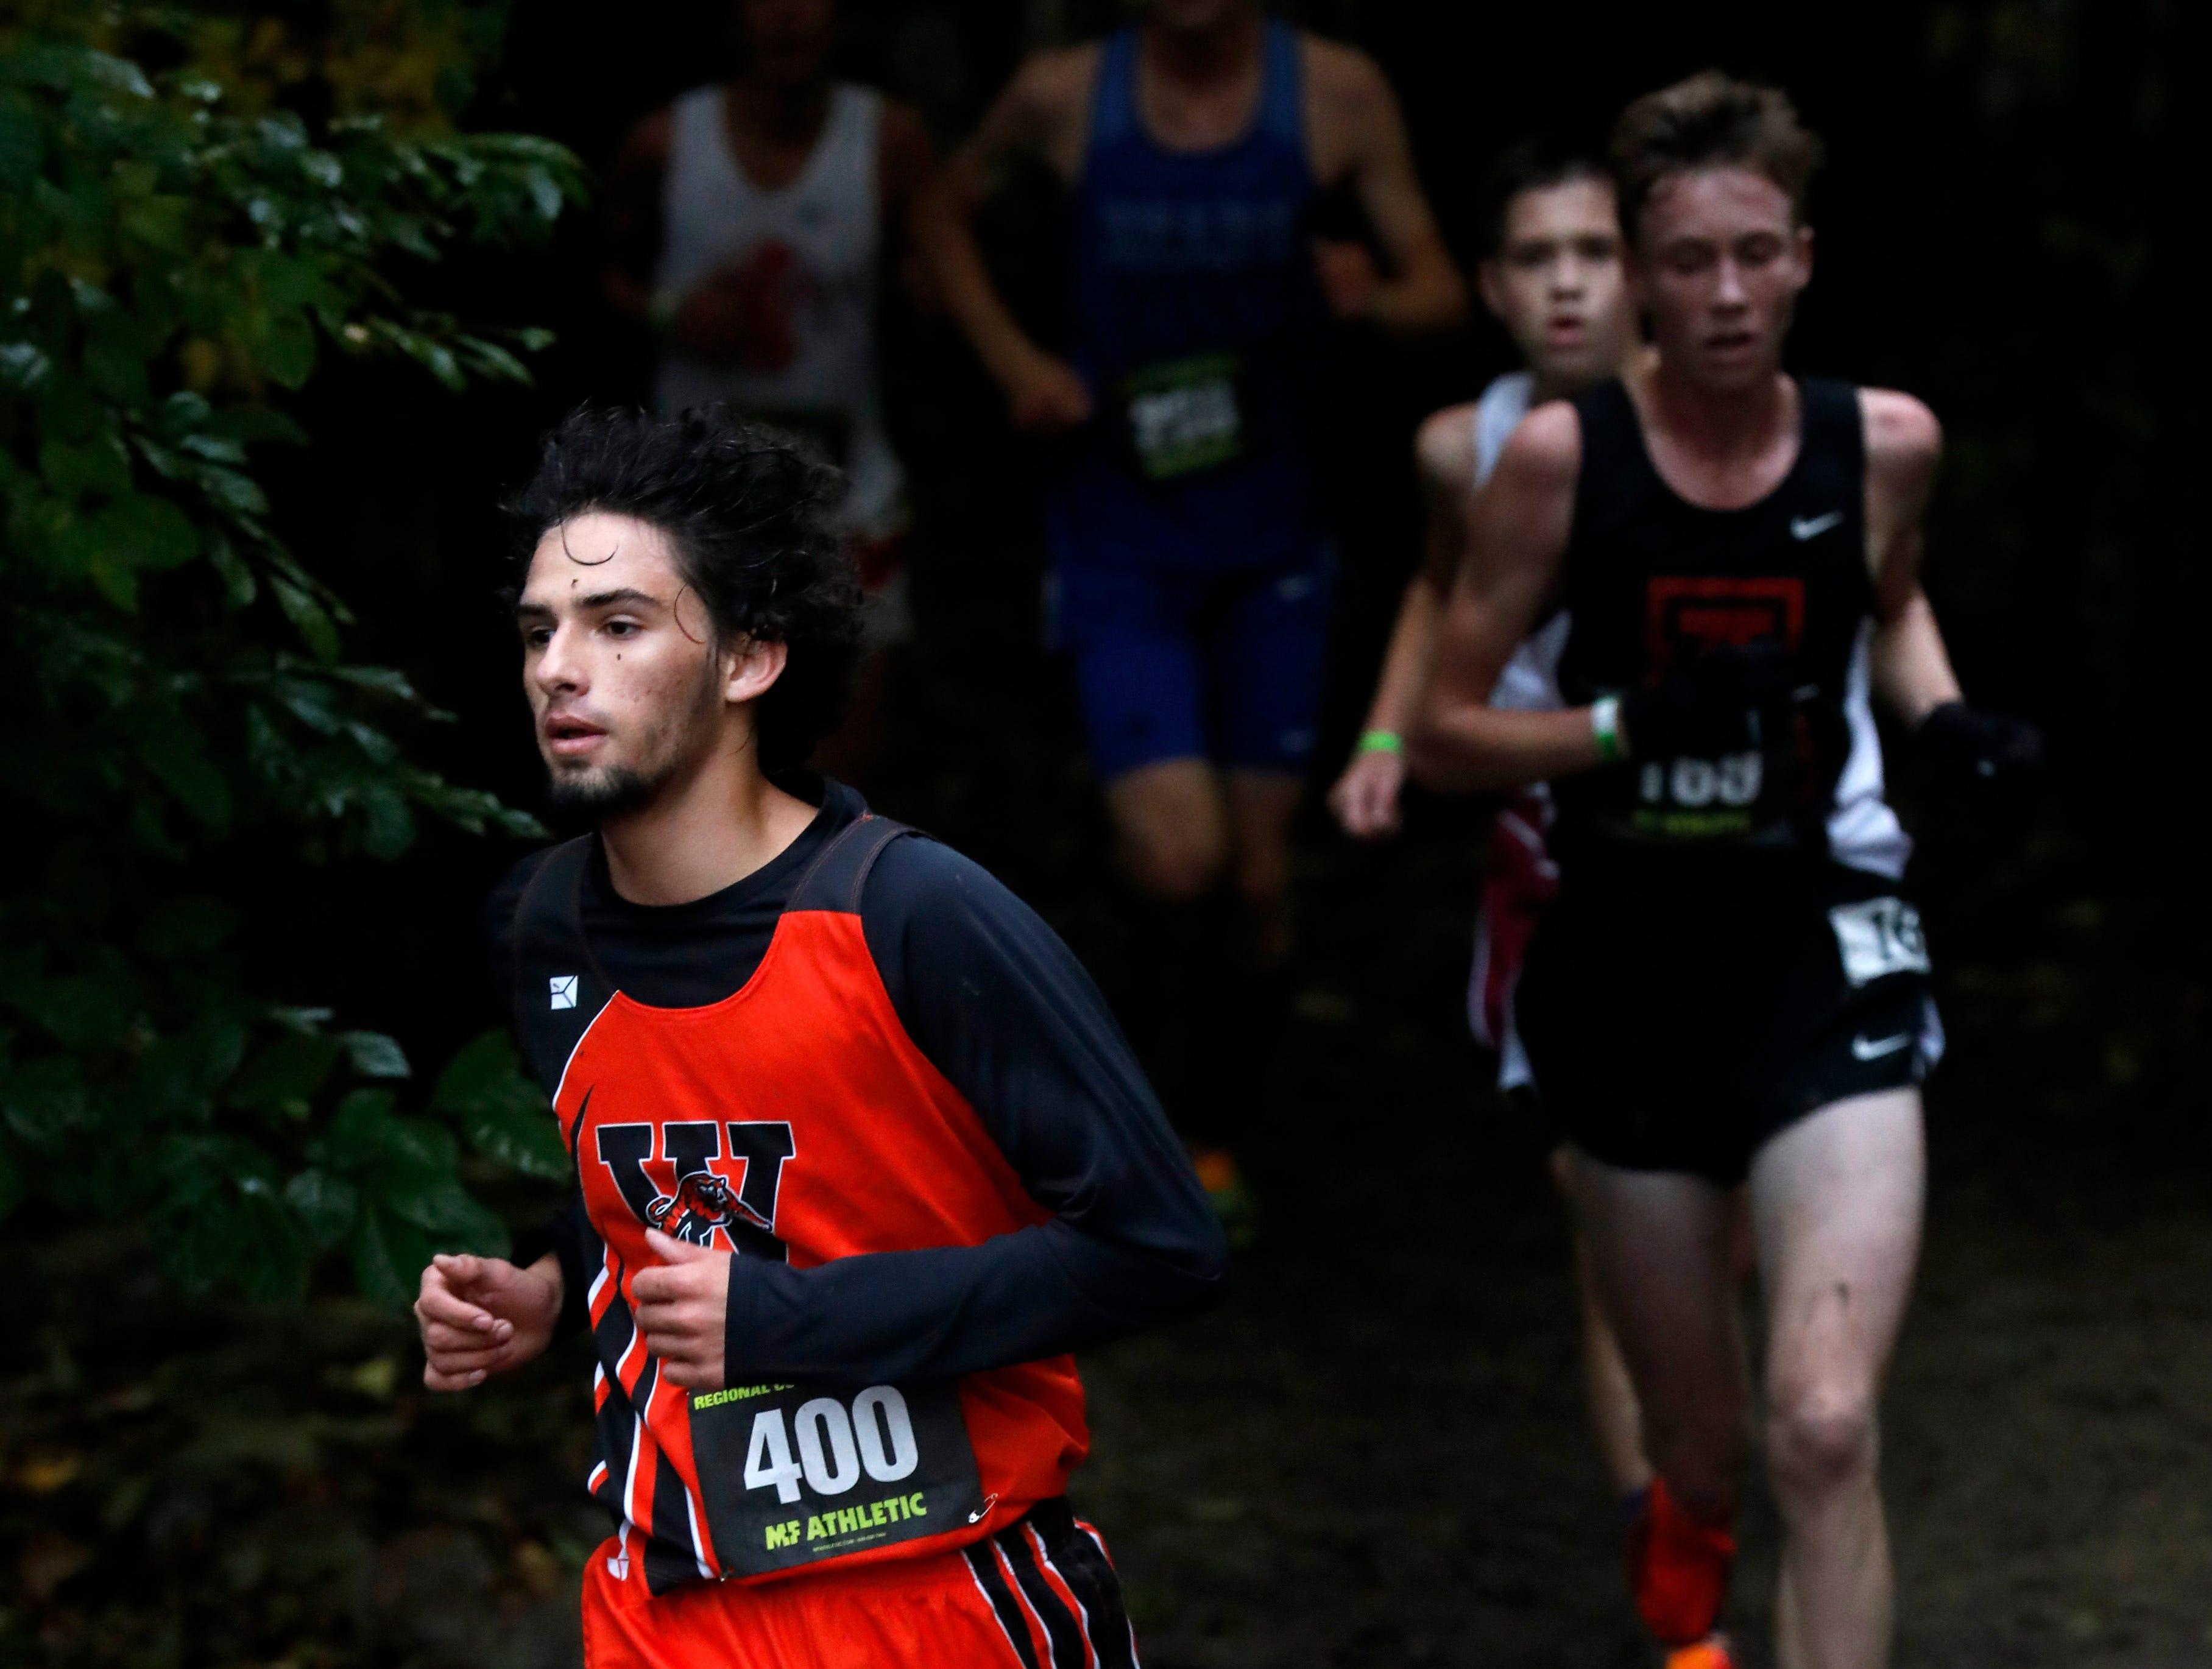 Waverly's Calob Ramirez runs in the Regional Cross Country meet Saturday, Oct. 27, 2018, at Pickerington North High School in Pickerington.